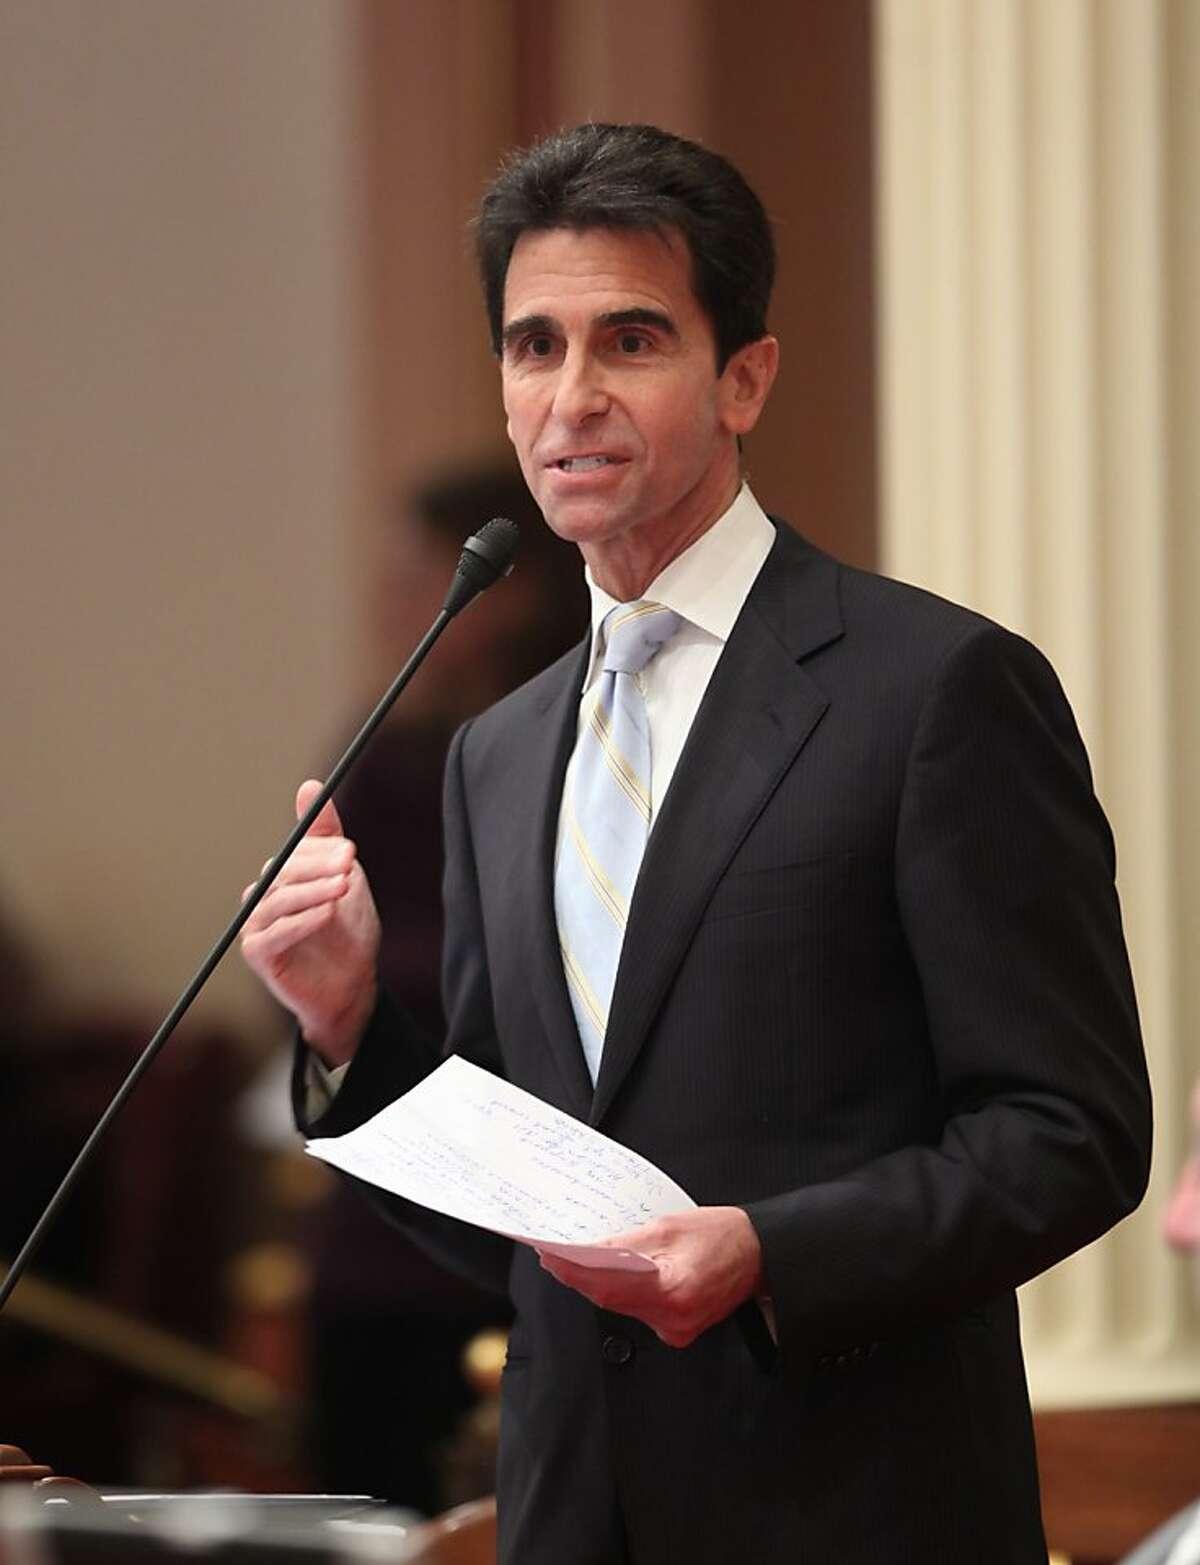 State Sen. Mark Leno, D-San Francisco,